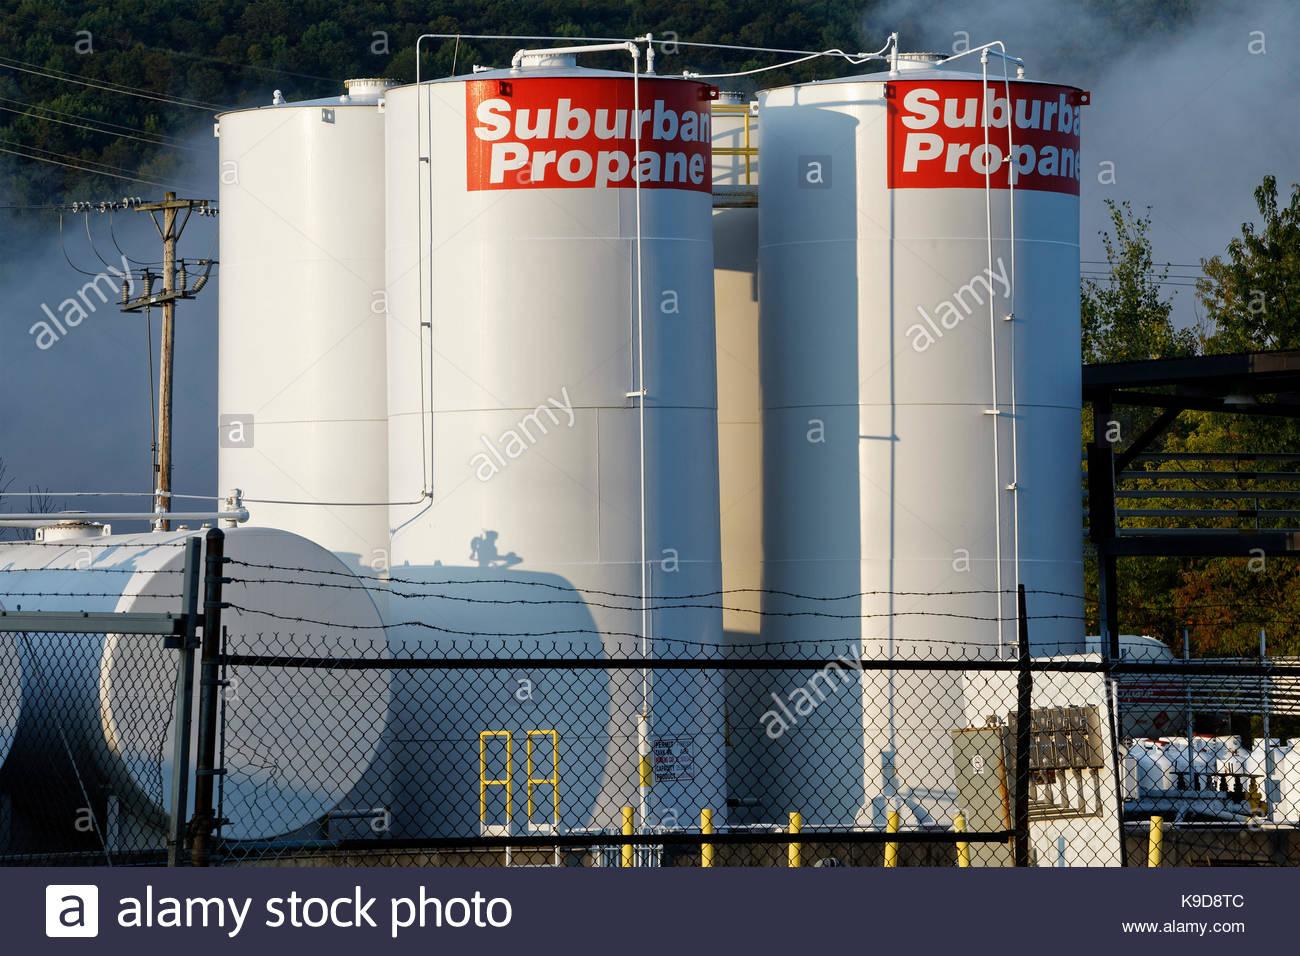 Propane storage tanks, New York, Cortland, NY, USA - Stock Image